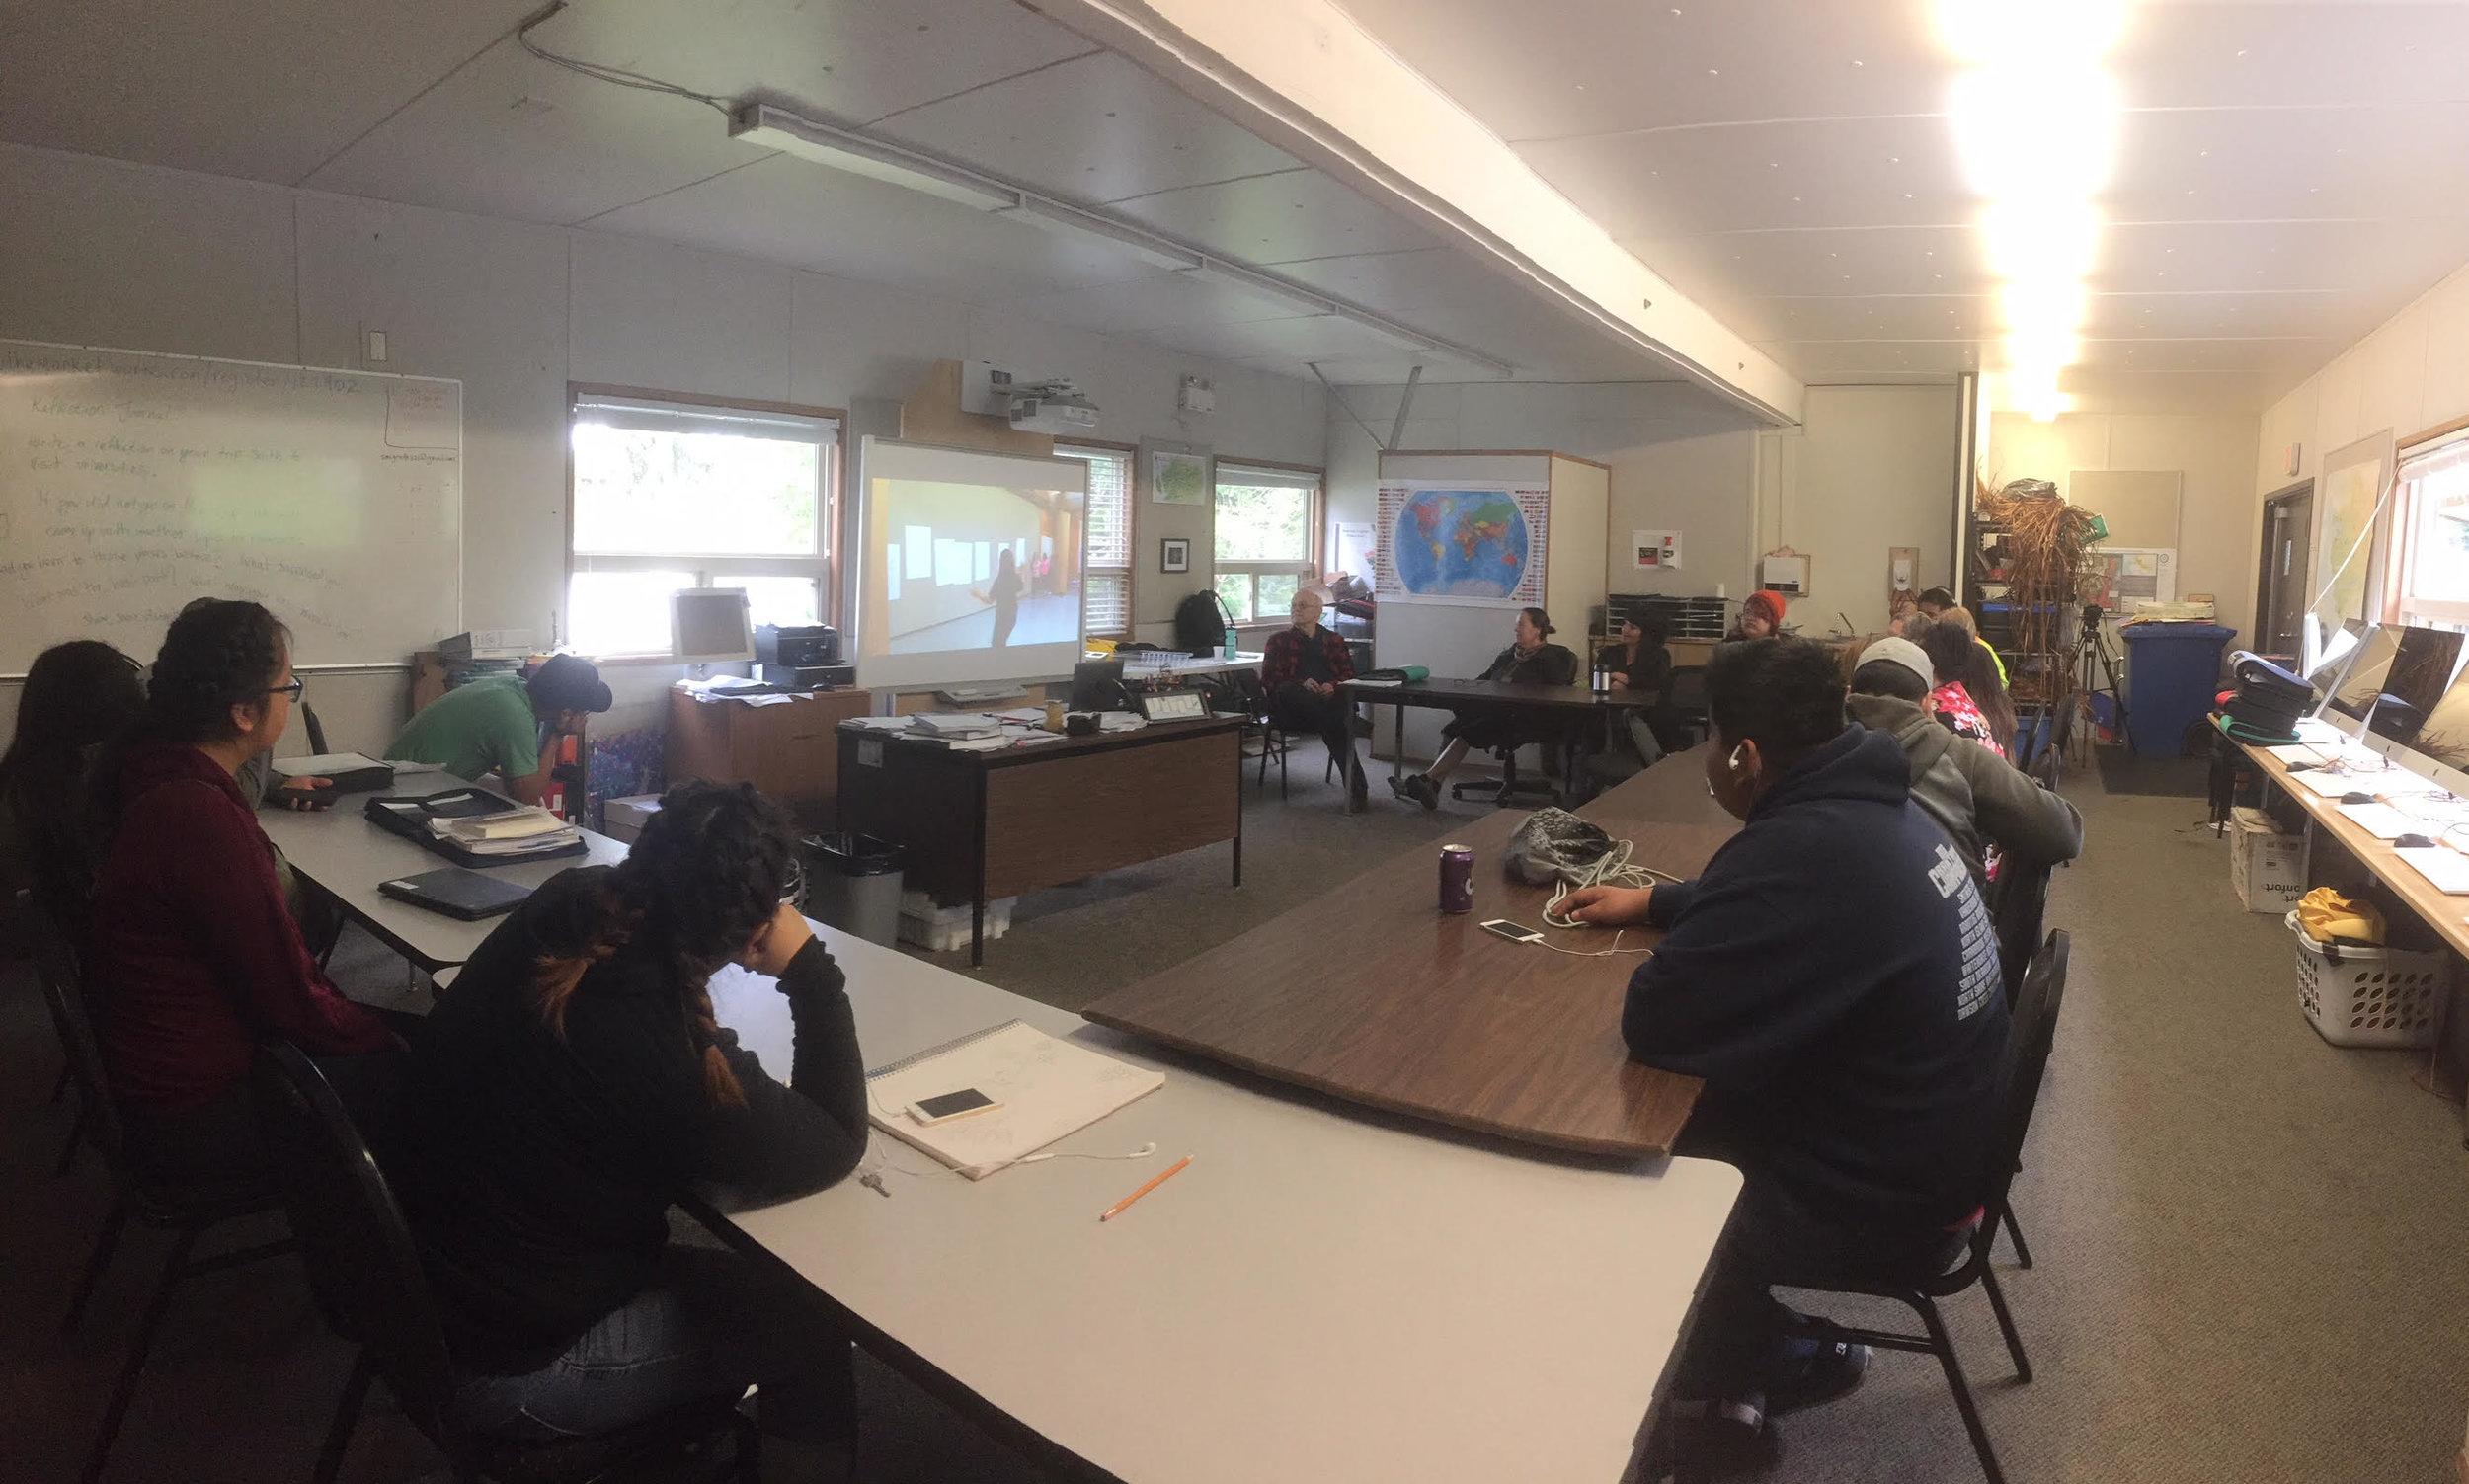 The senior student classroom